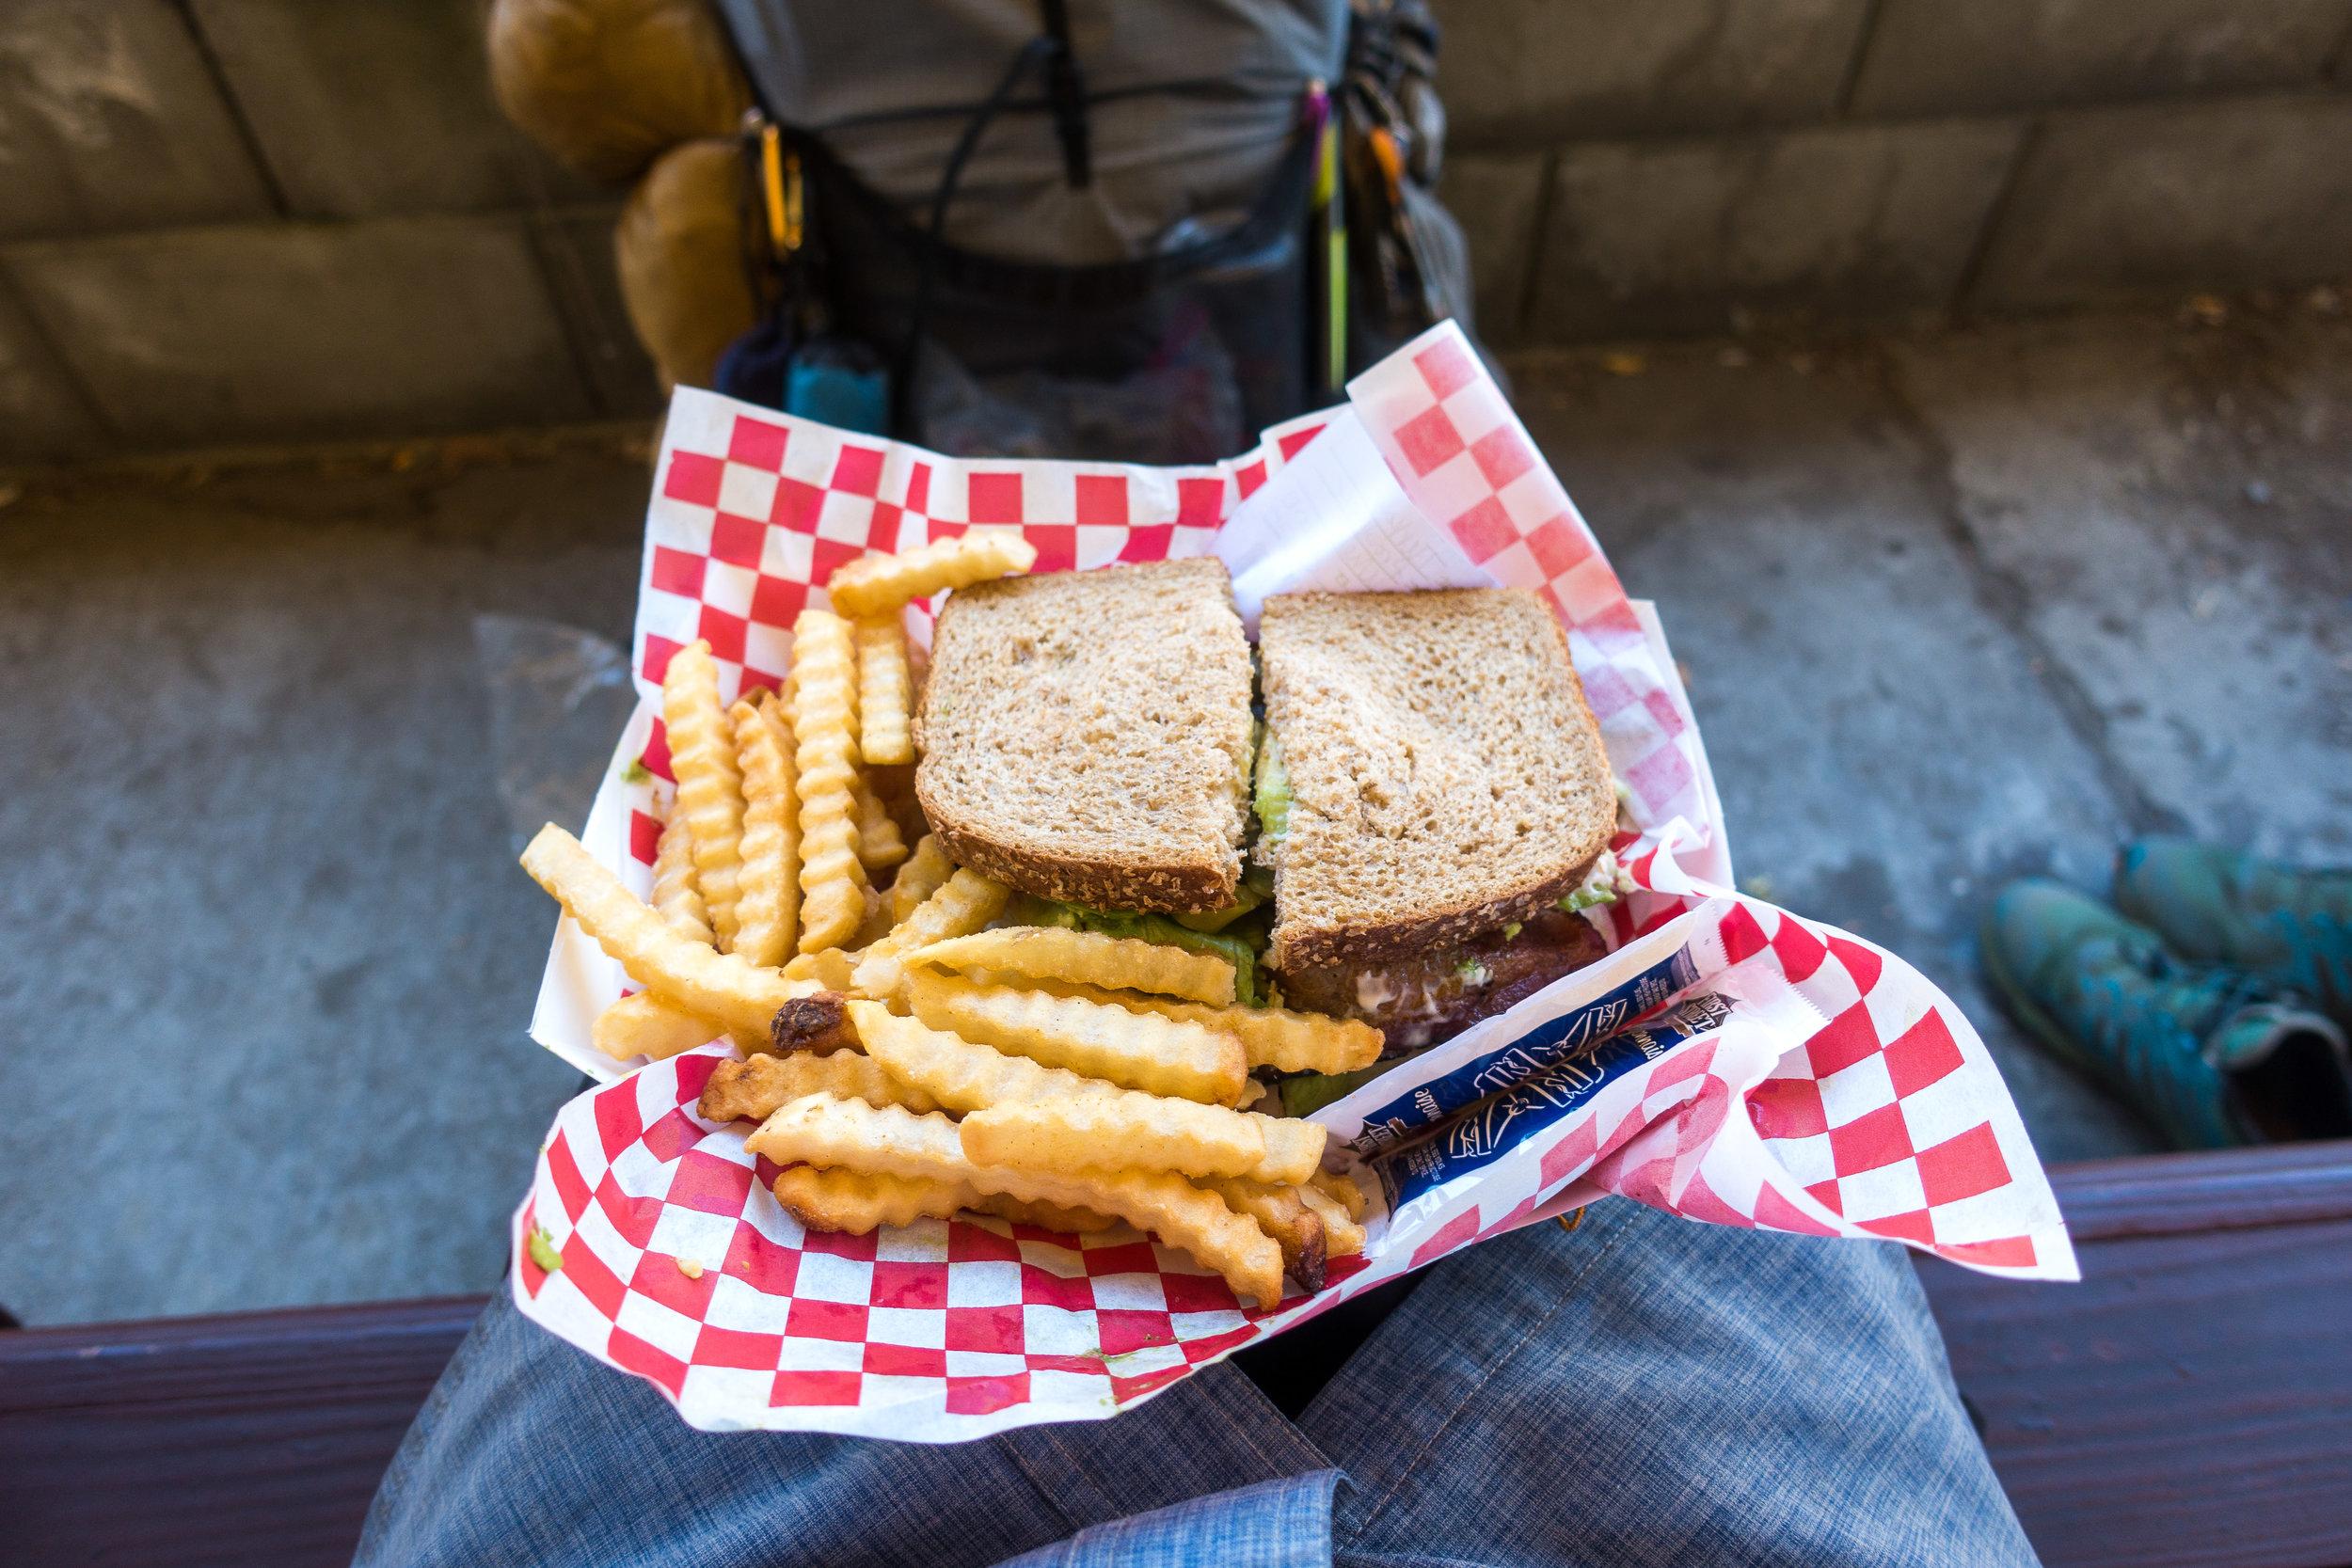 My sandwich.